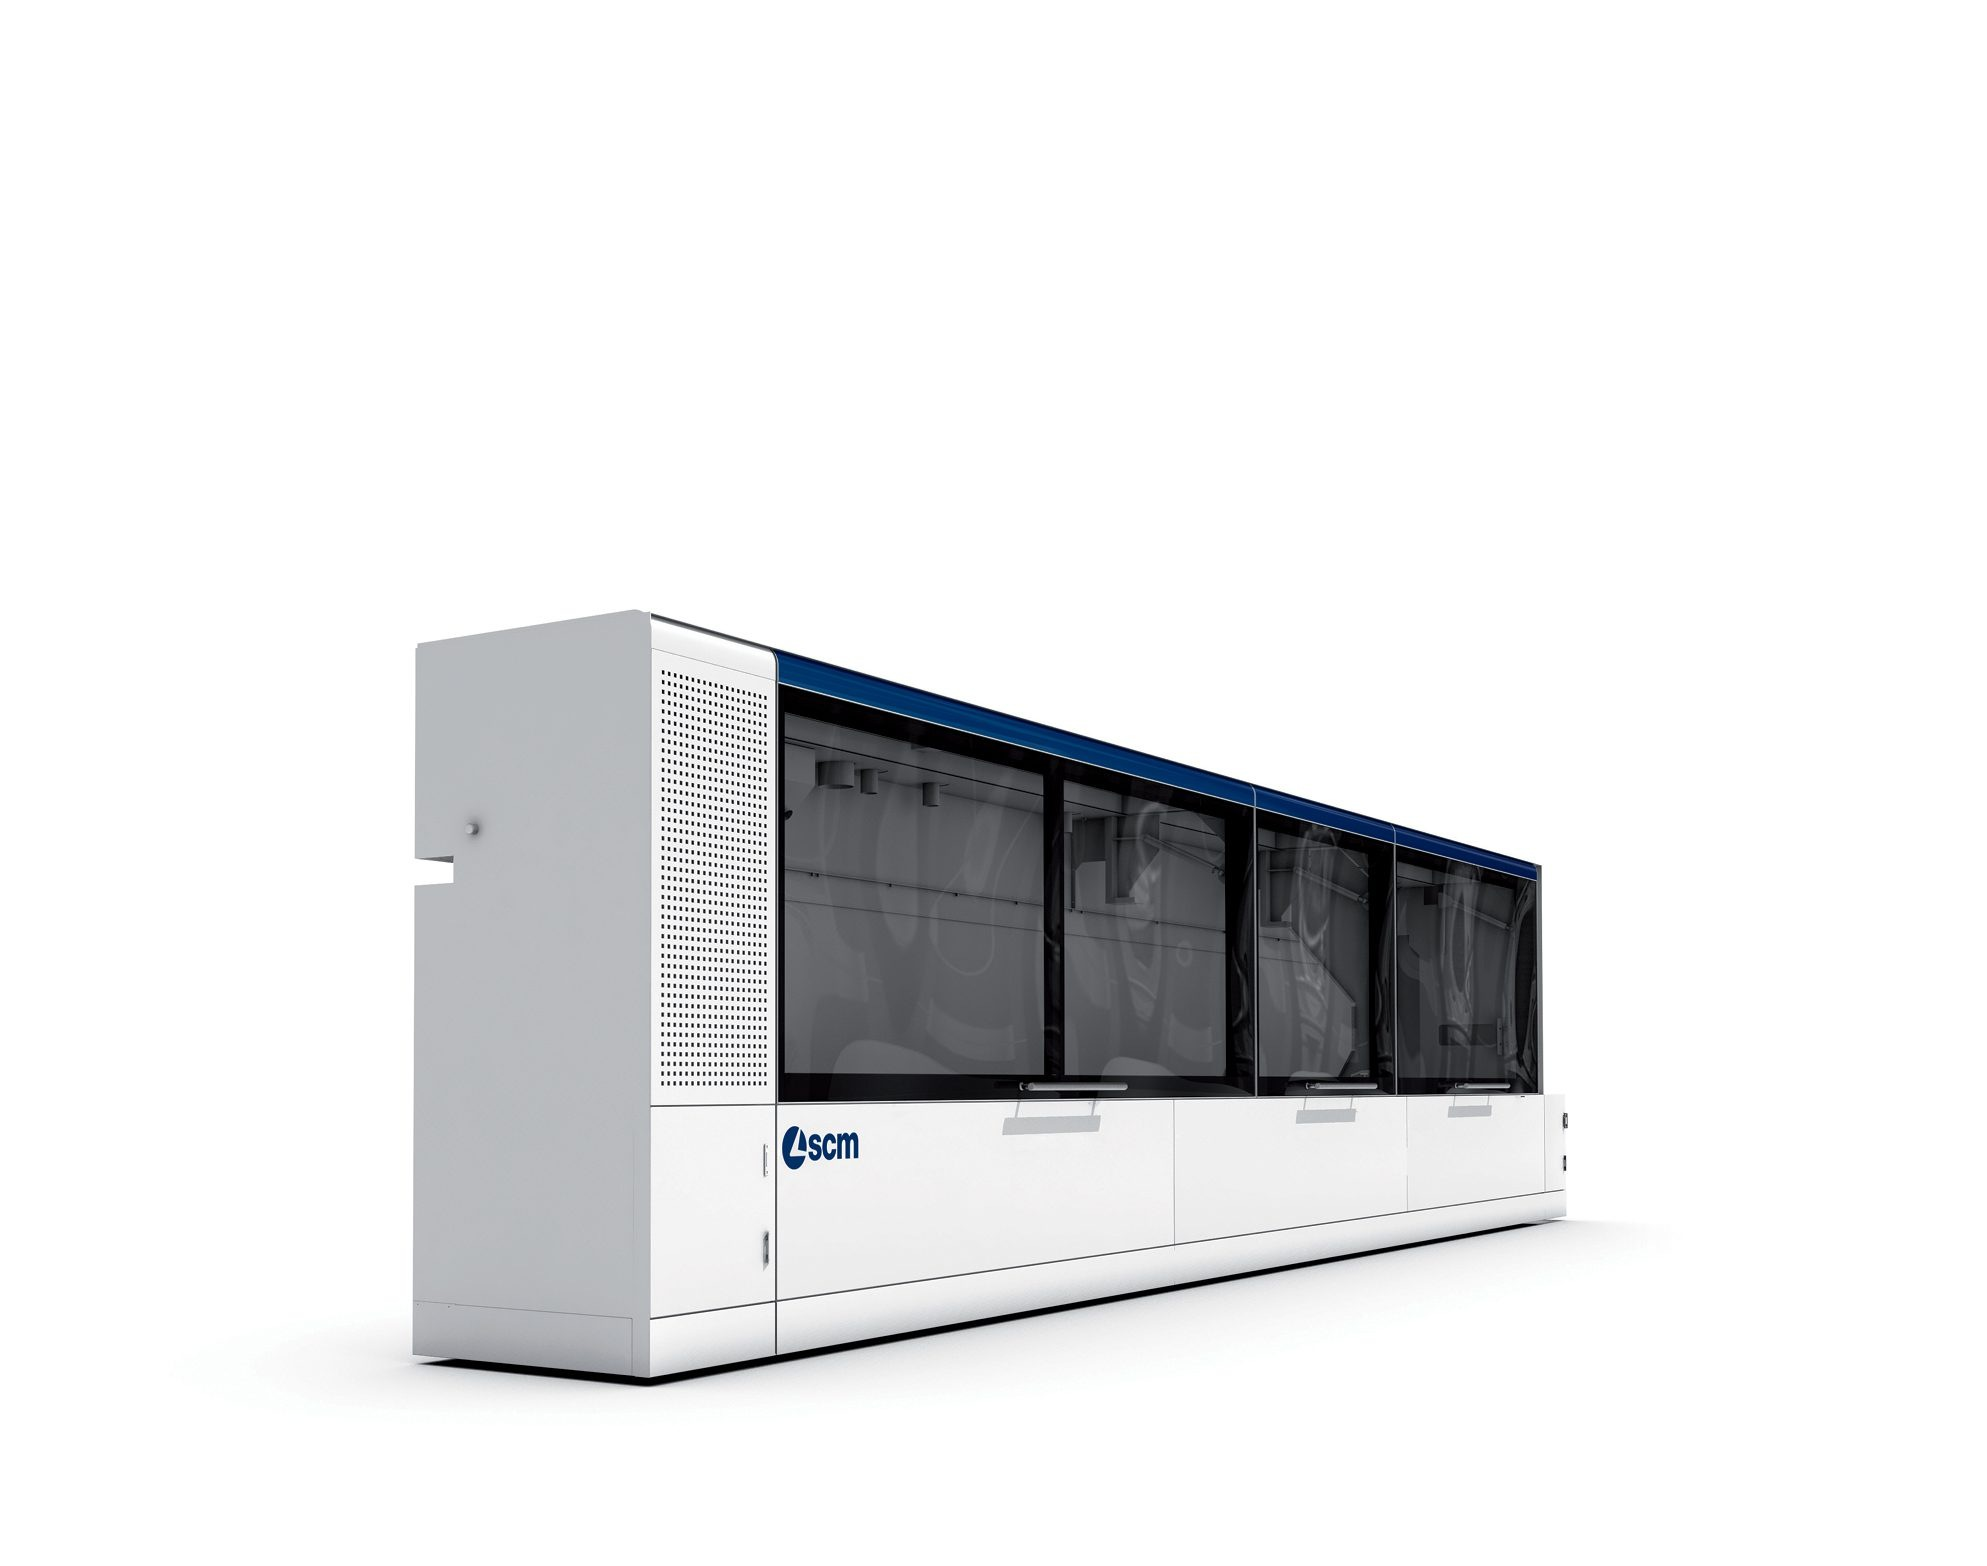 Industrial design carrozzeria macchina bordatrice SCM Group